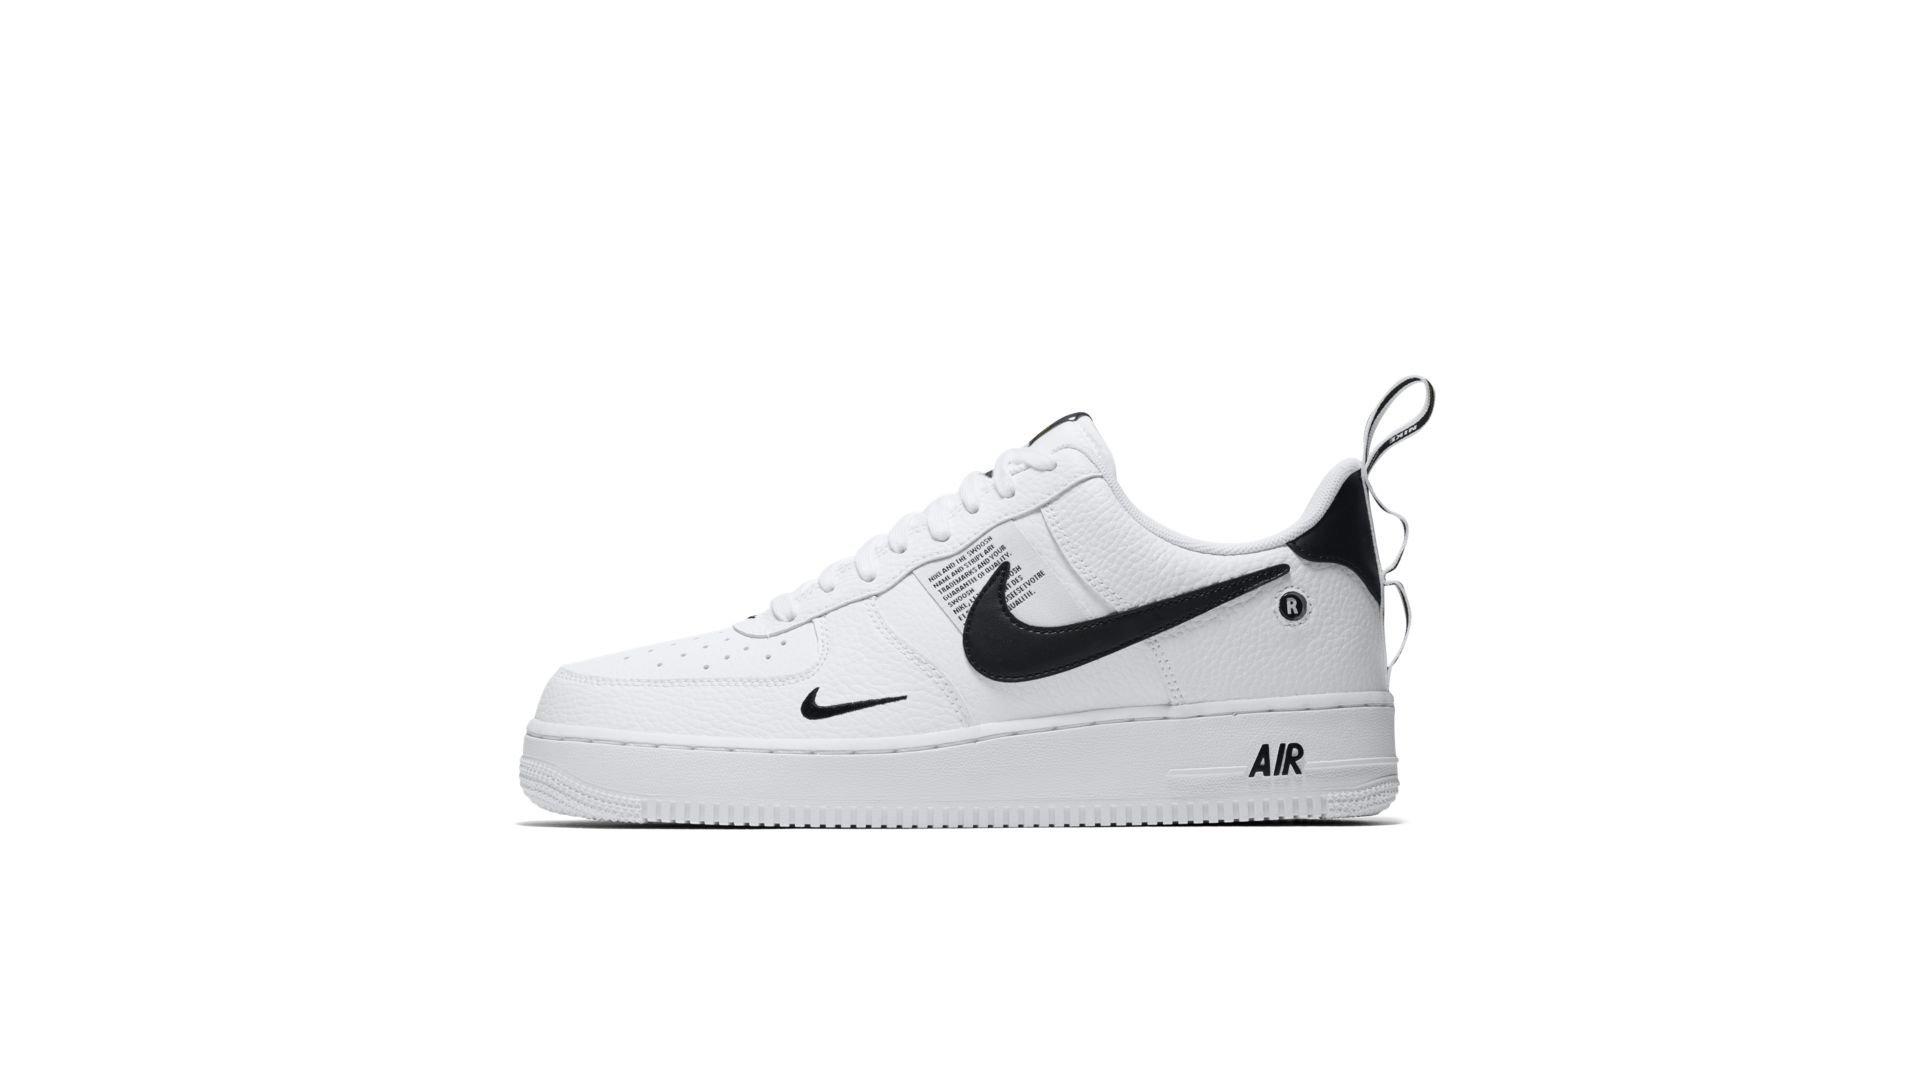 Nike Air Force 1 '07 LV8 Utility 'White' (AJ7747-100)